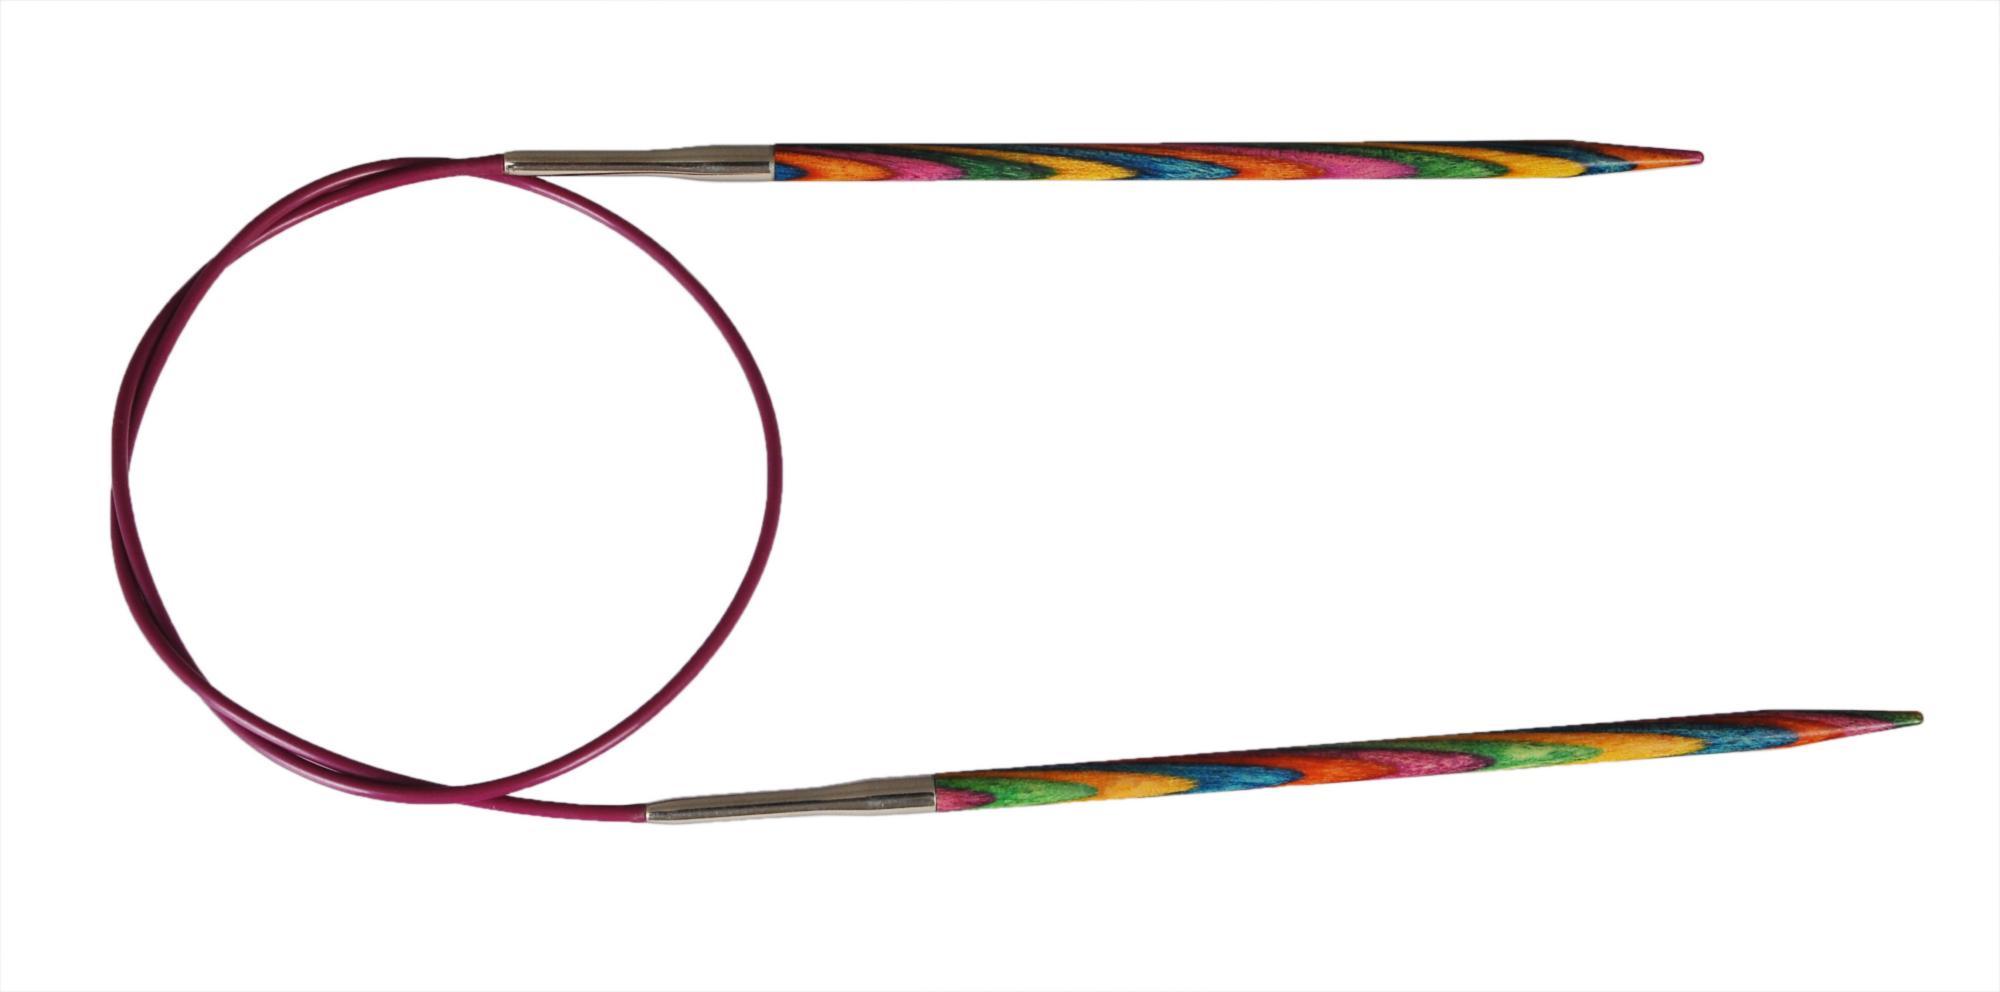 Спицы круговые 120 см Symfonie Wood KnitPro, 20368, 2.25 мм